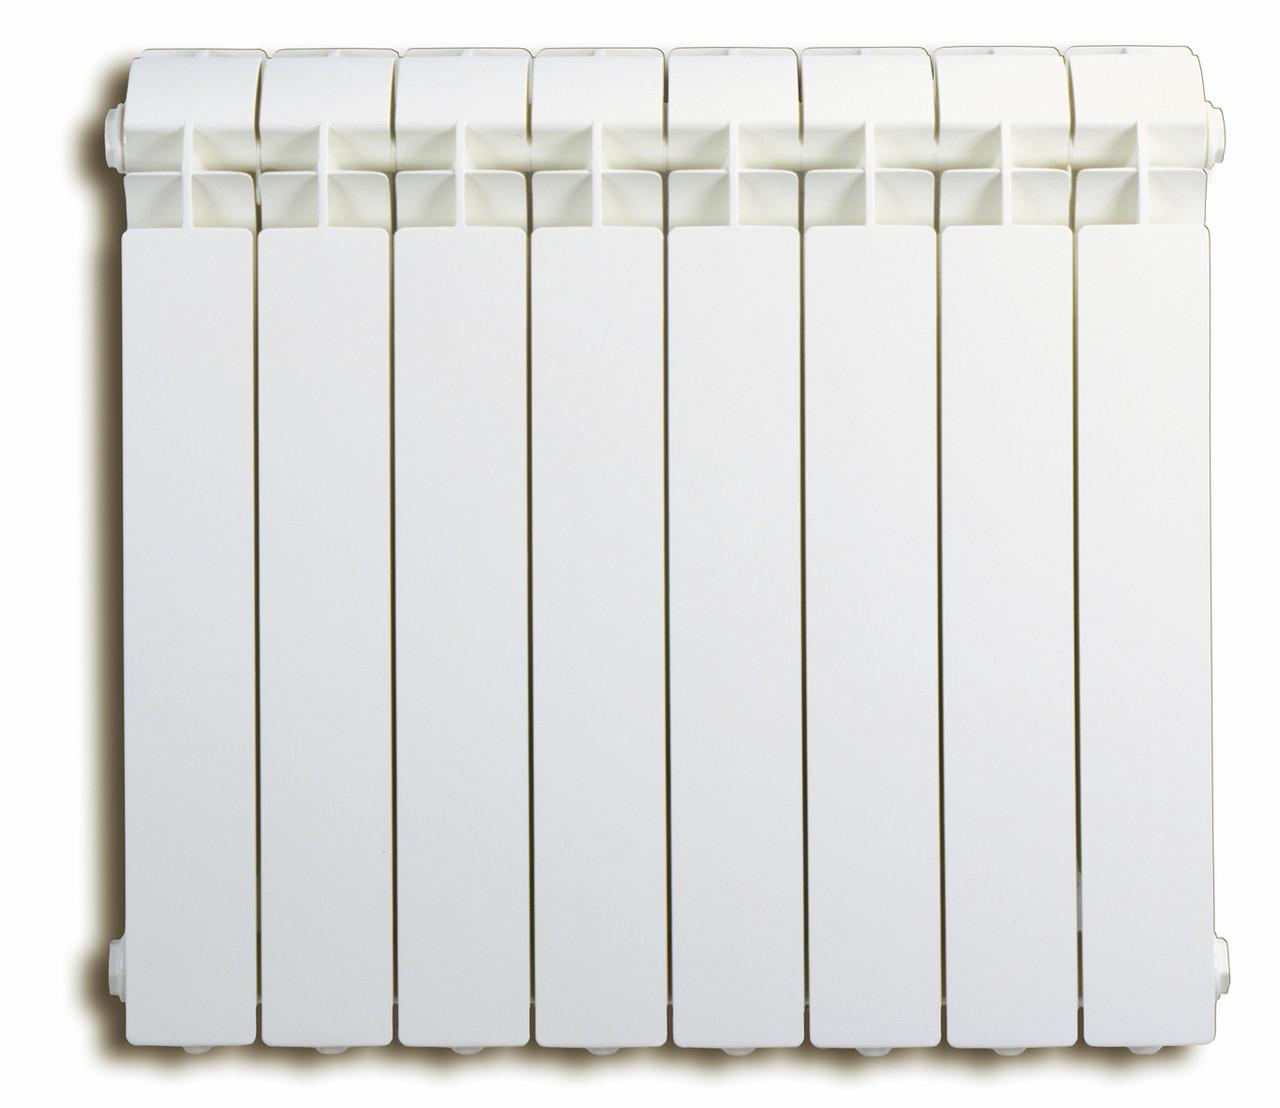 Биметаллический радиатор Global Style Plus 350/100 (Италия)